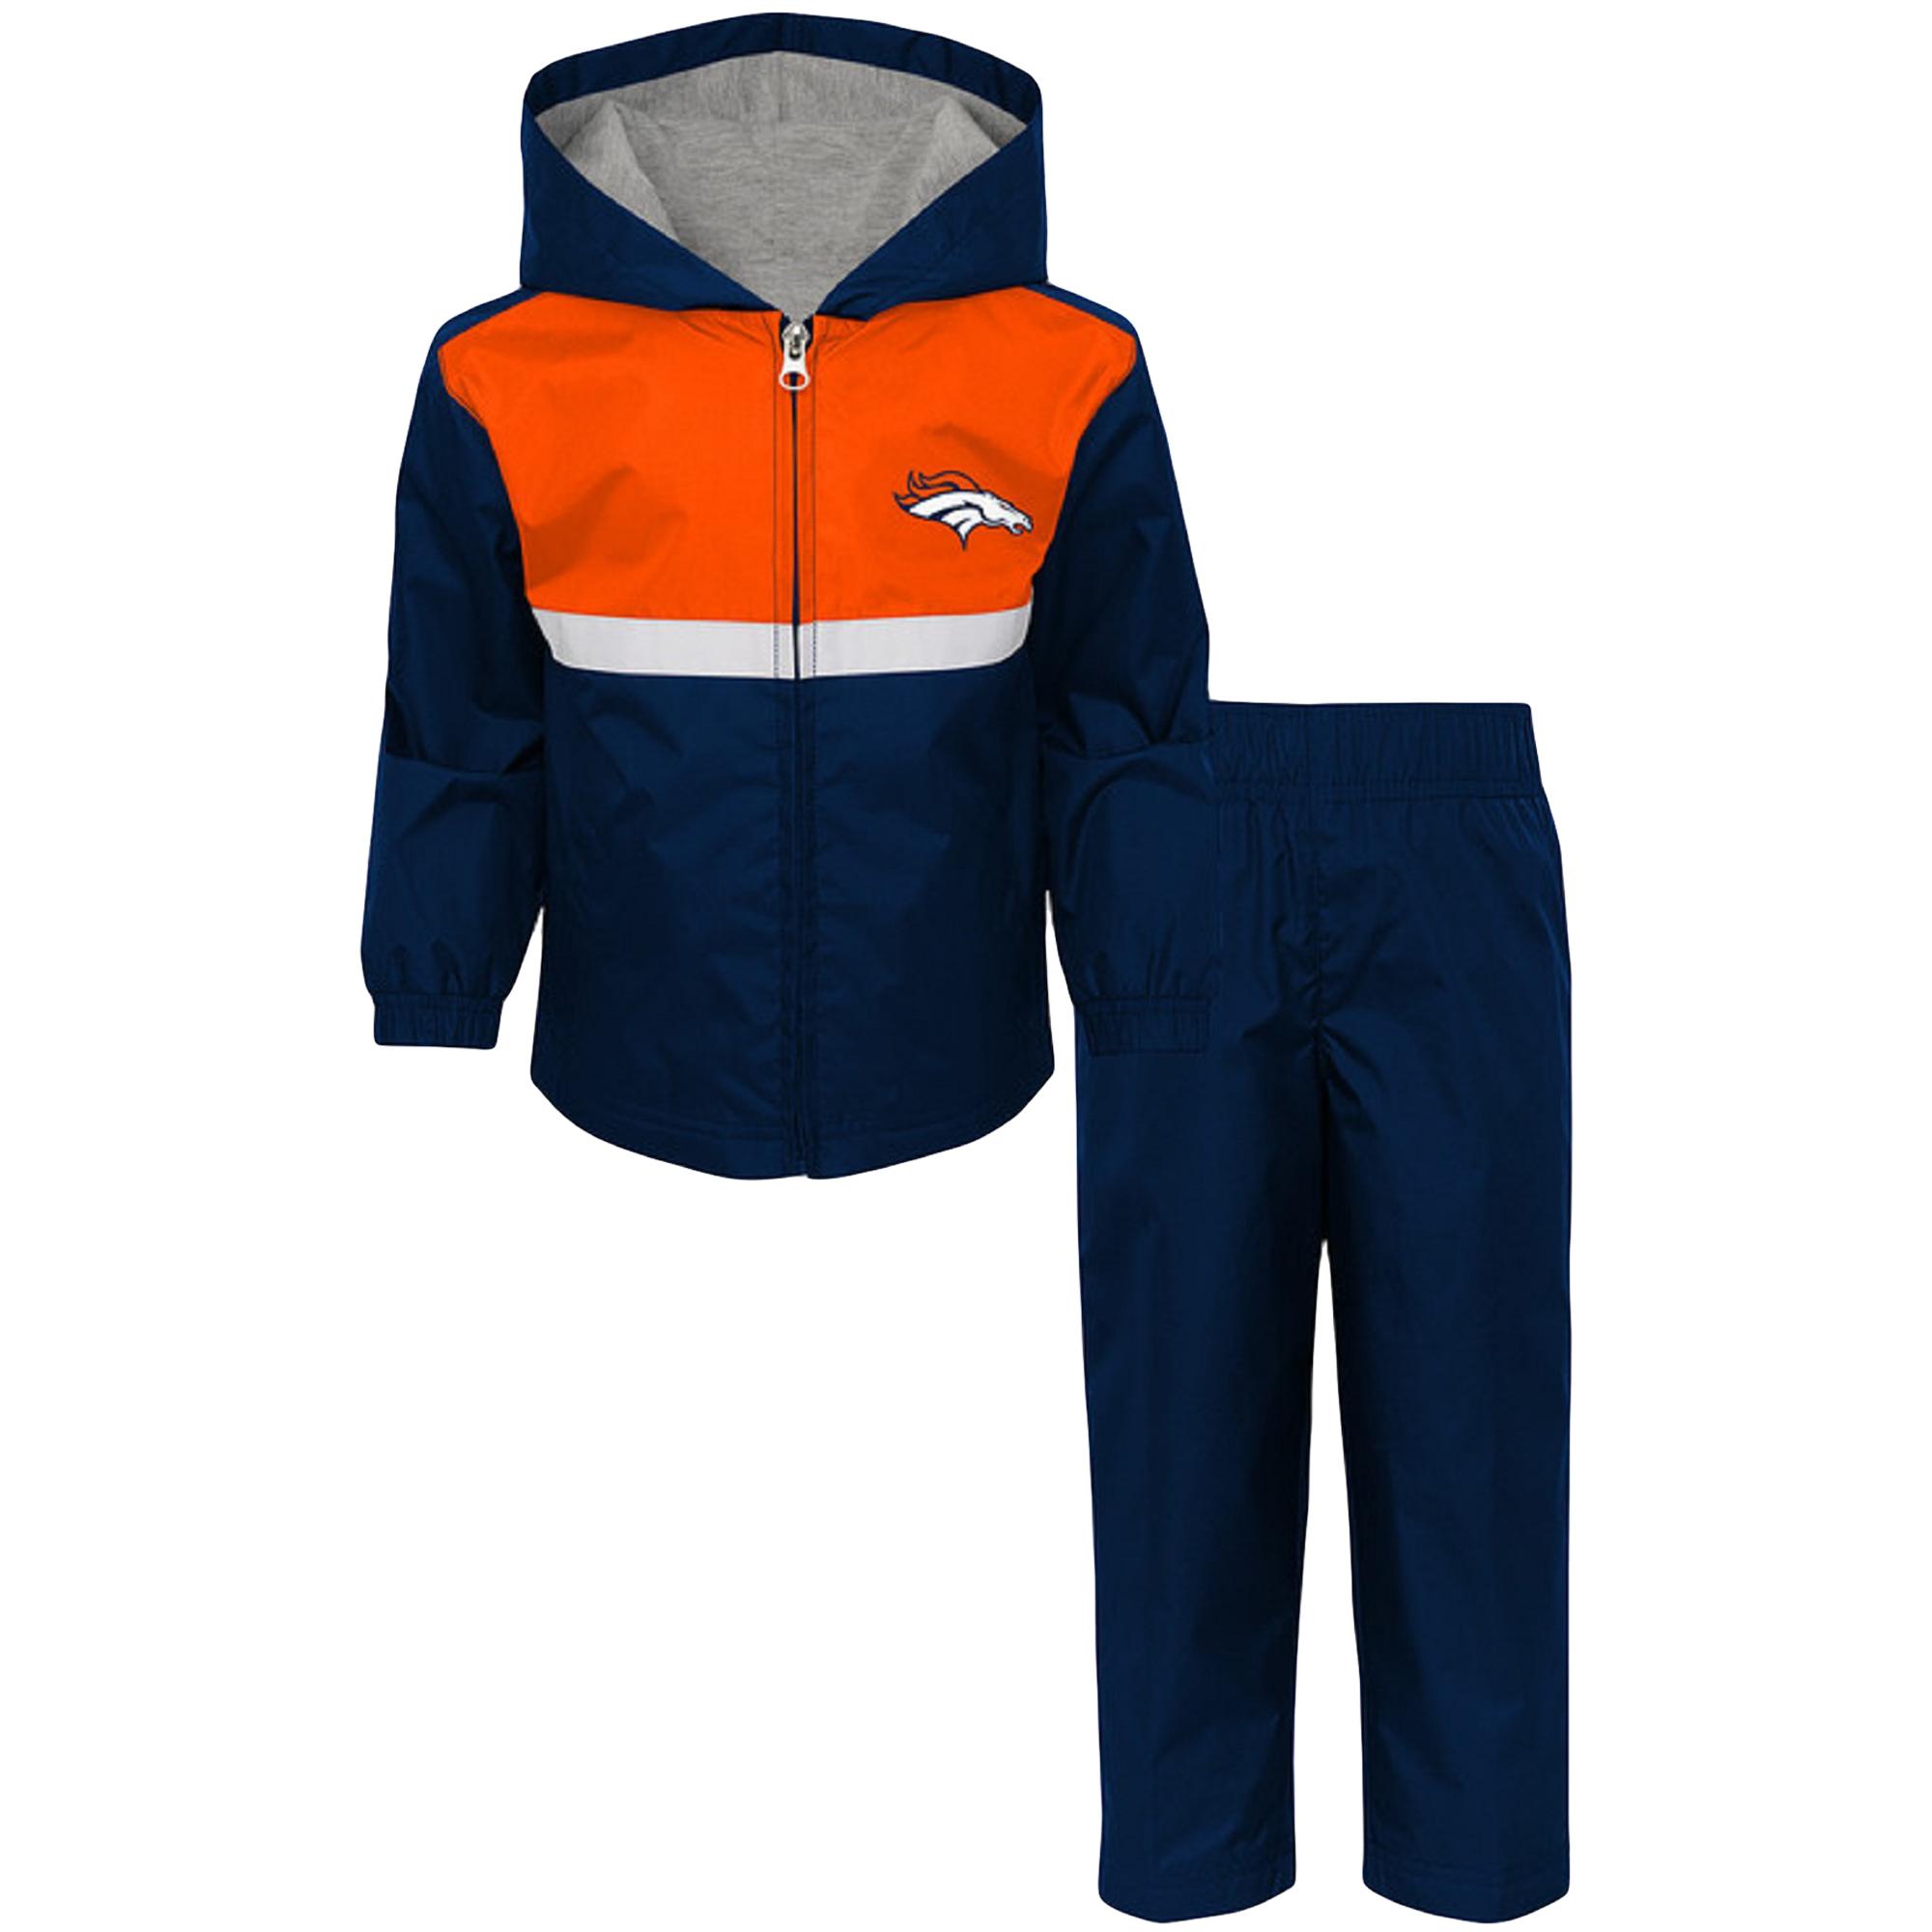 Toddler Navy/Orange Denver Broncos Full-Zip Jacket & Pants Set